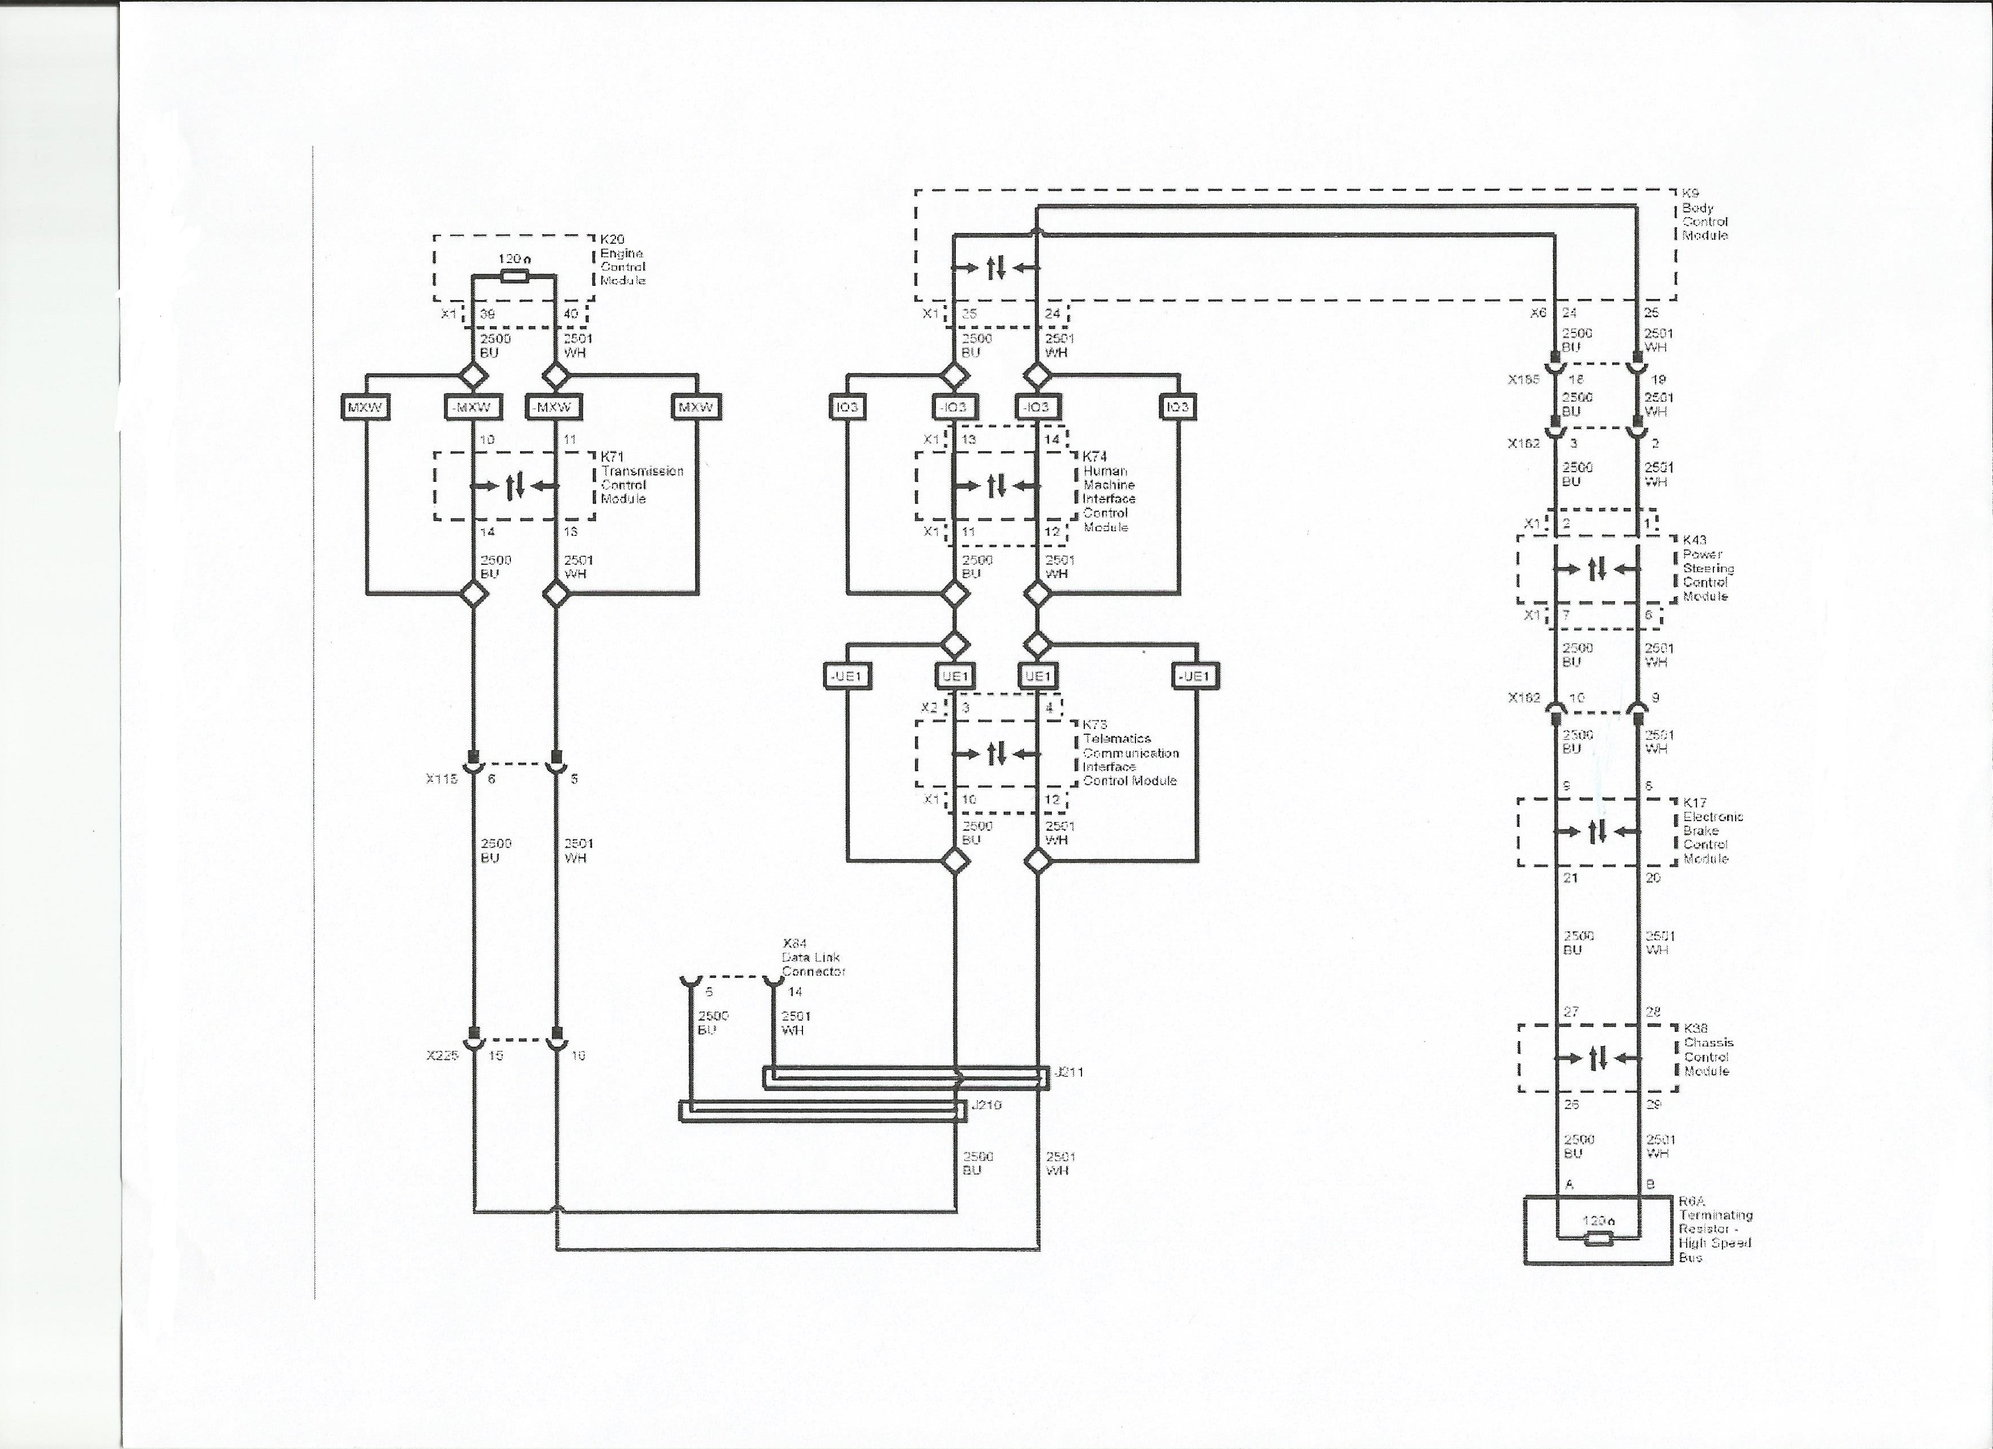 E92 Ls Swap Wiring